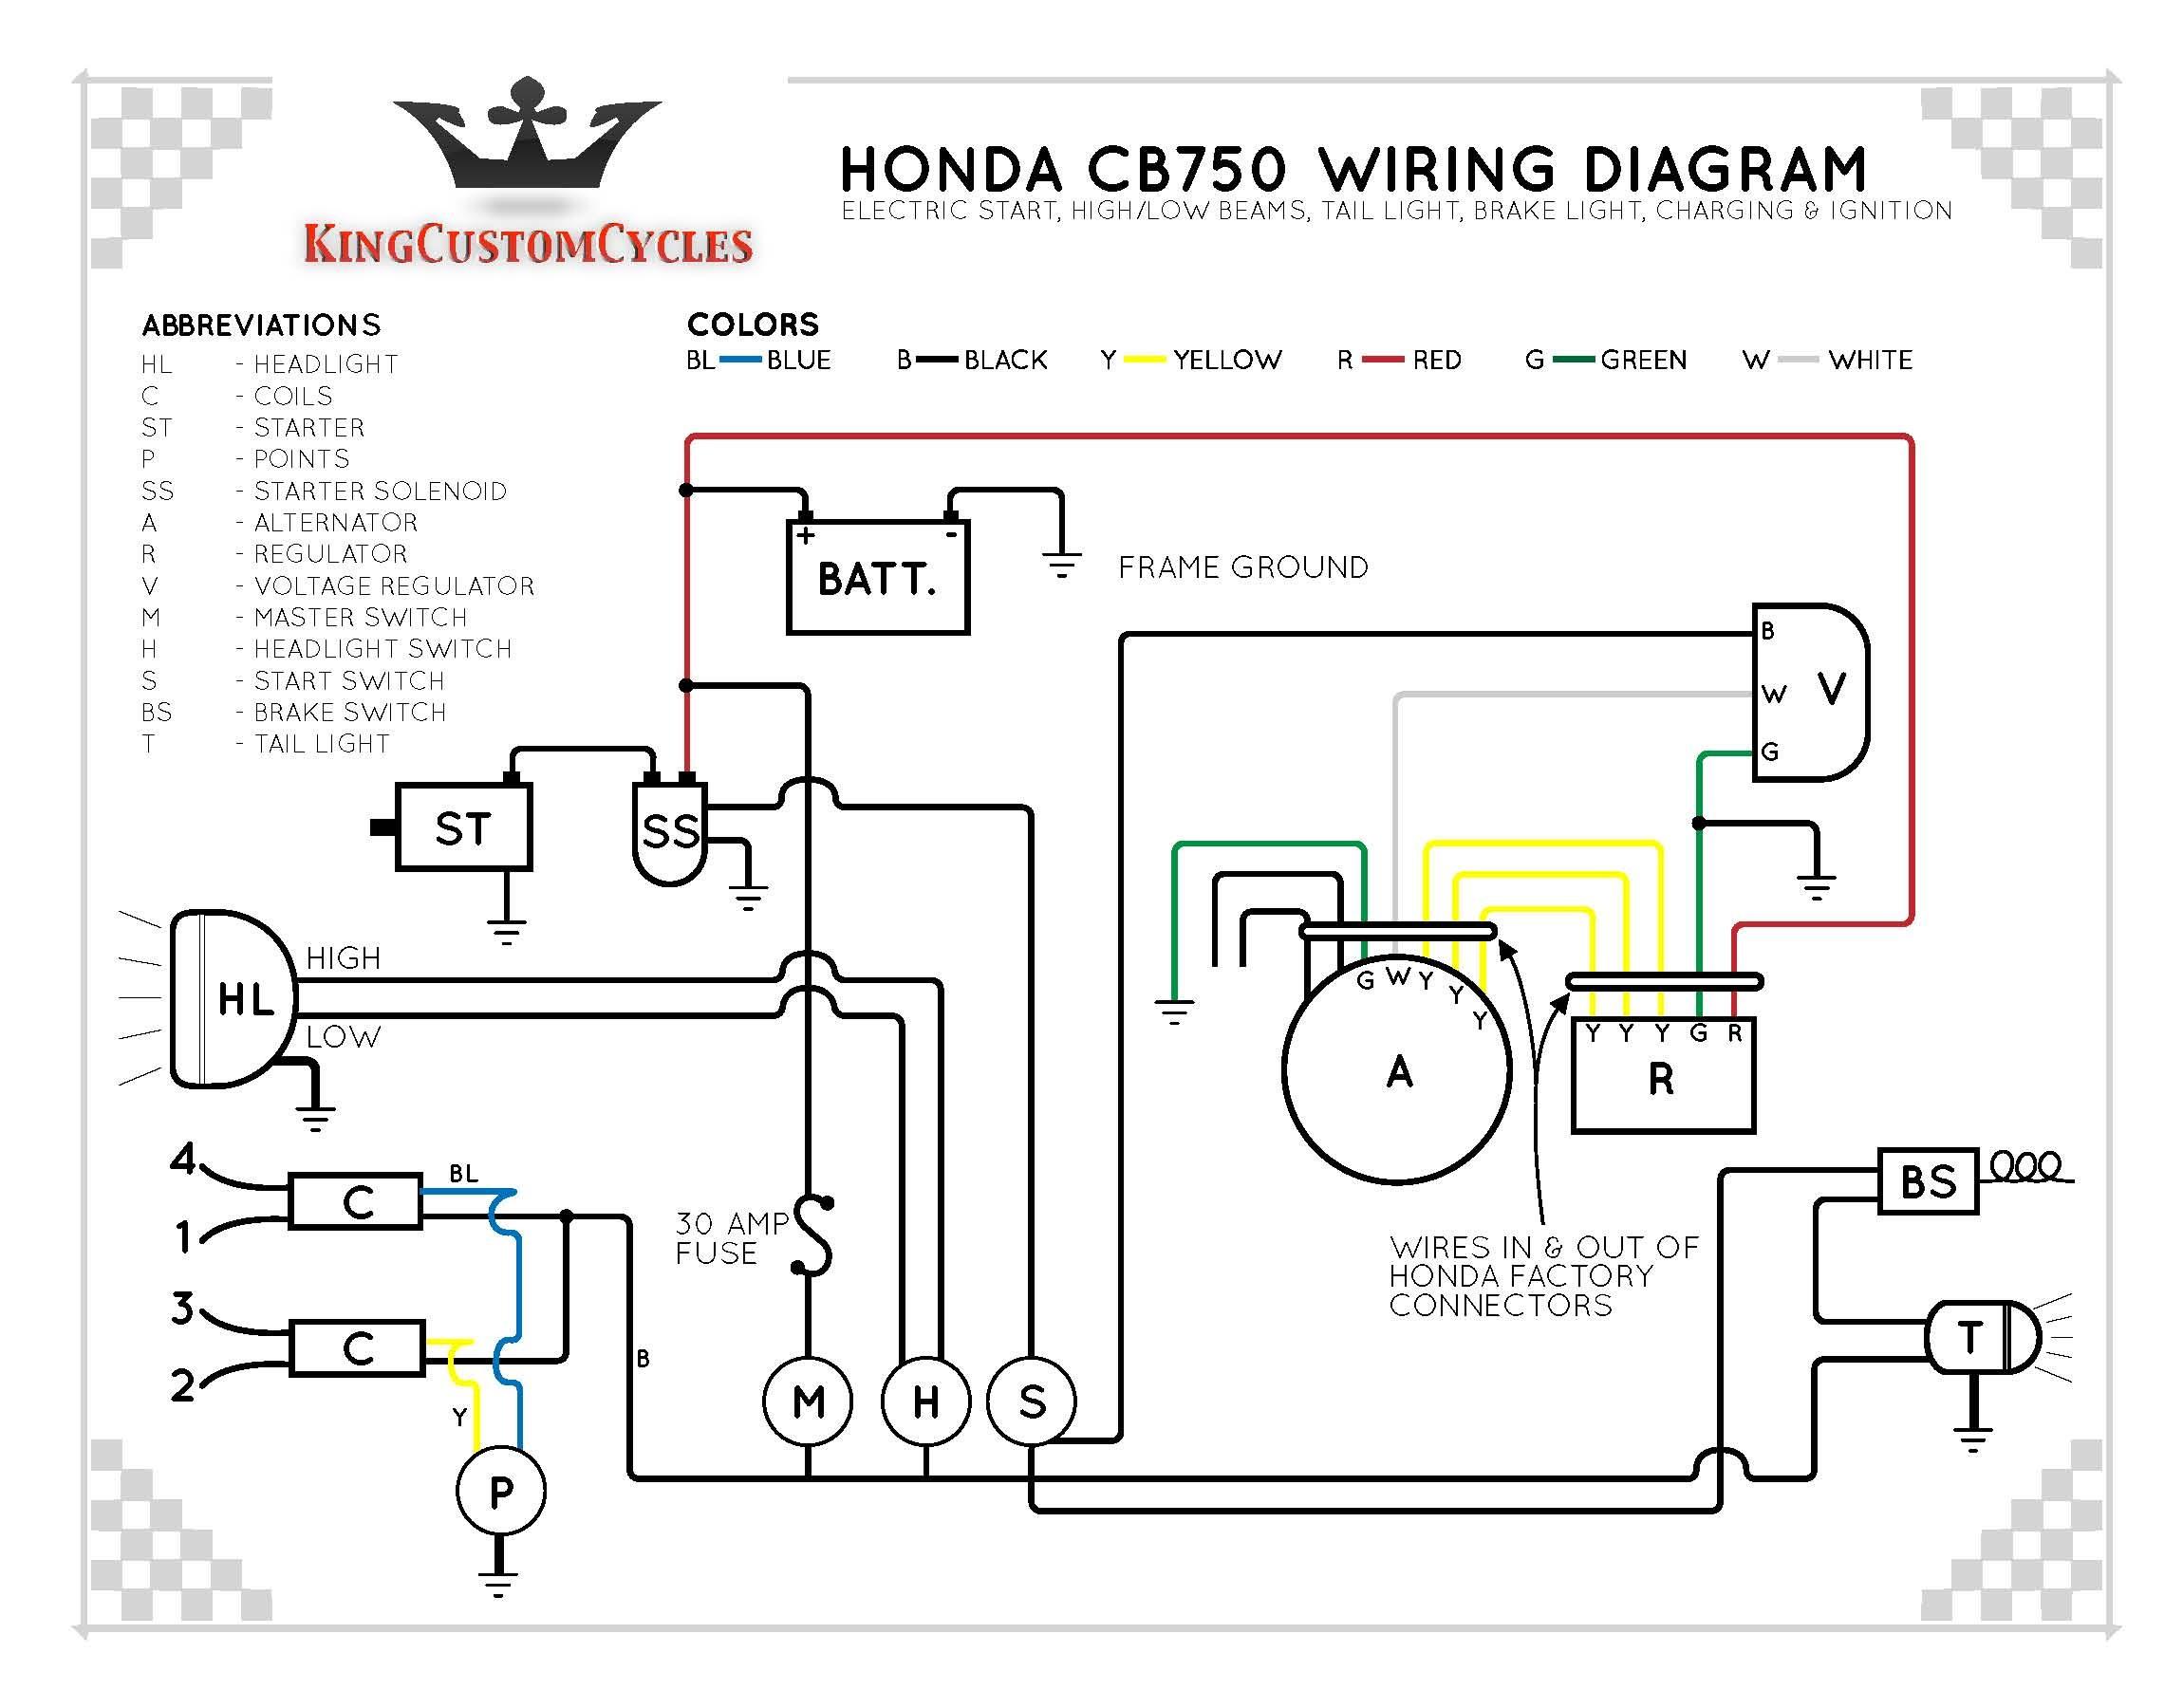 honda cb750 chopper wiring diagram cb750 starter solenoid wiring diagram e1 wiring diagram  cb750 starter solenoid wiring diagram